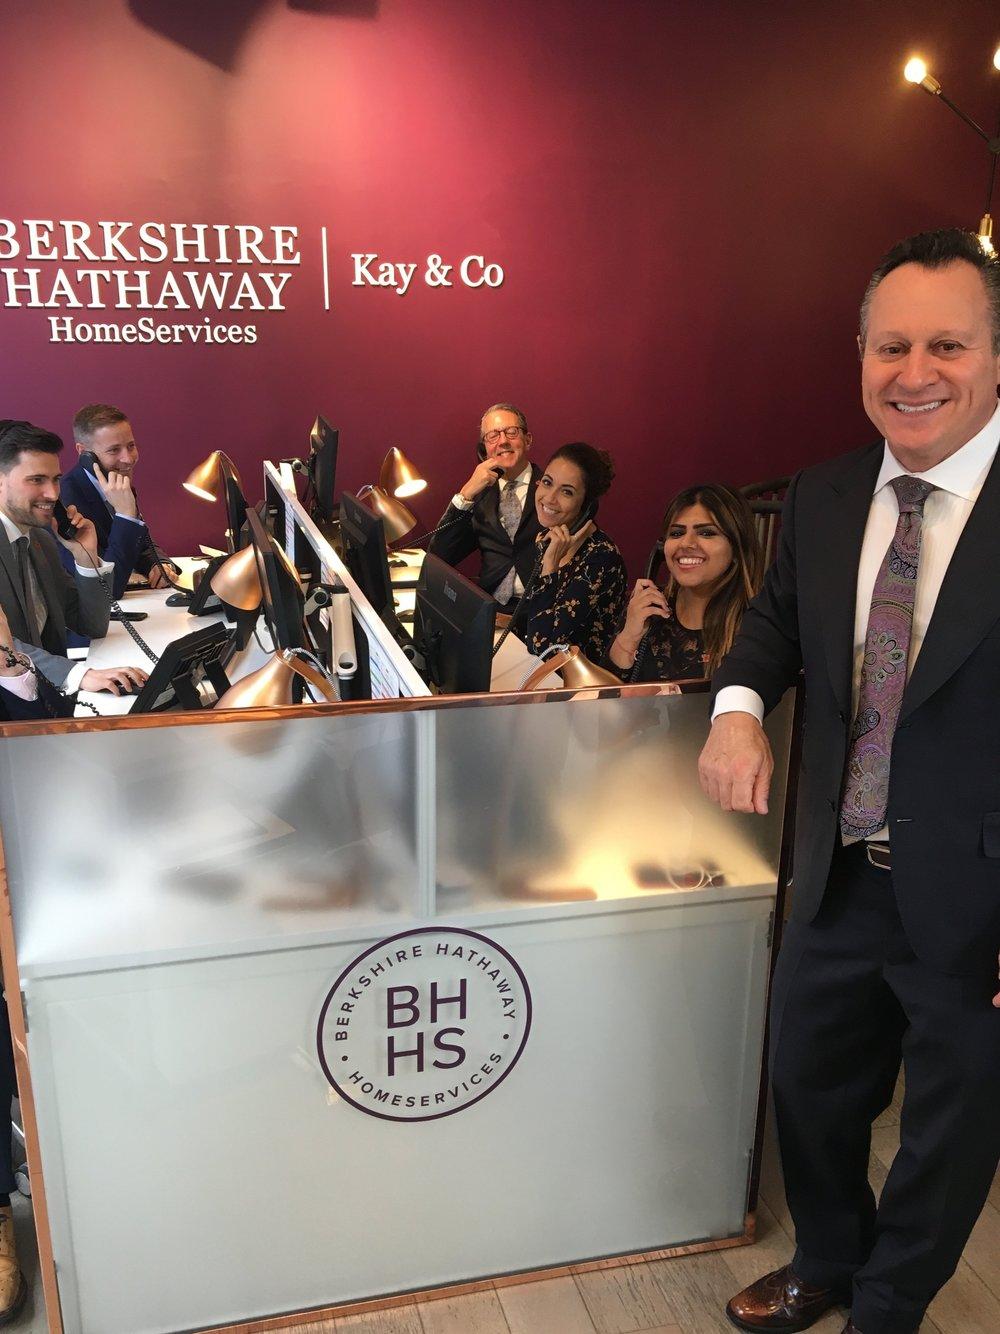 Berkshire+Hathaway+Hojme+Services+Kay+%26+Co++internal.jpg